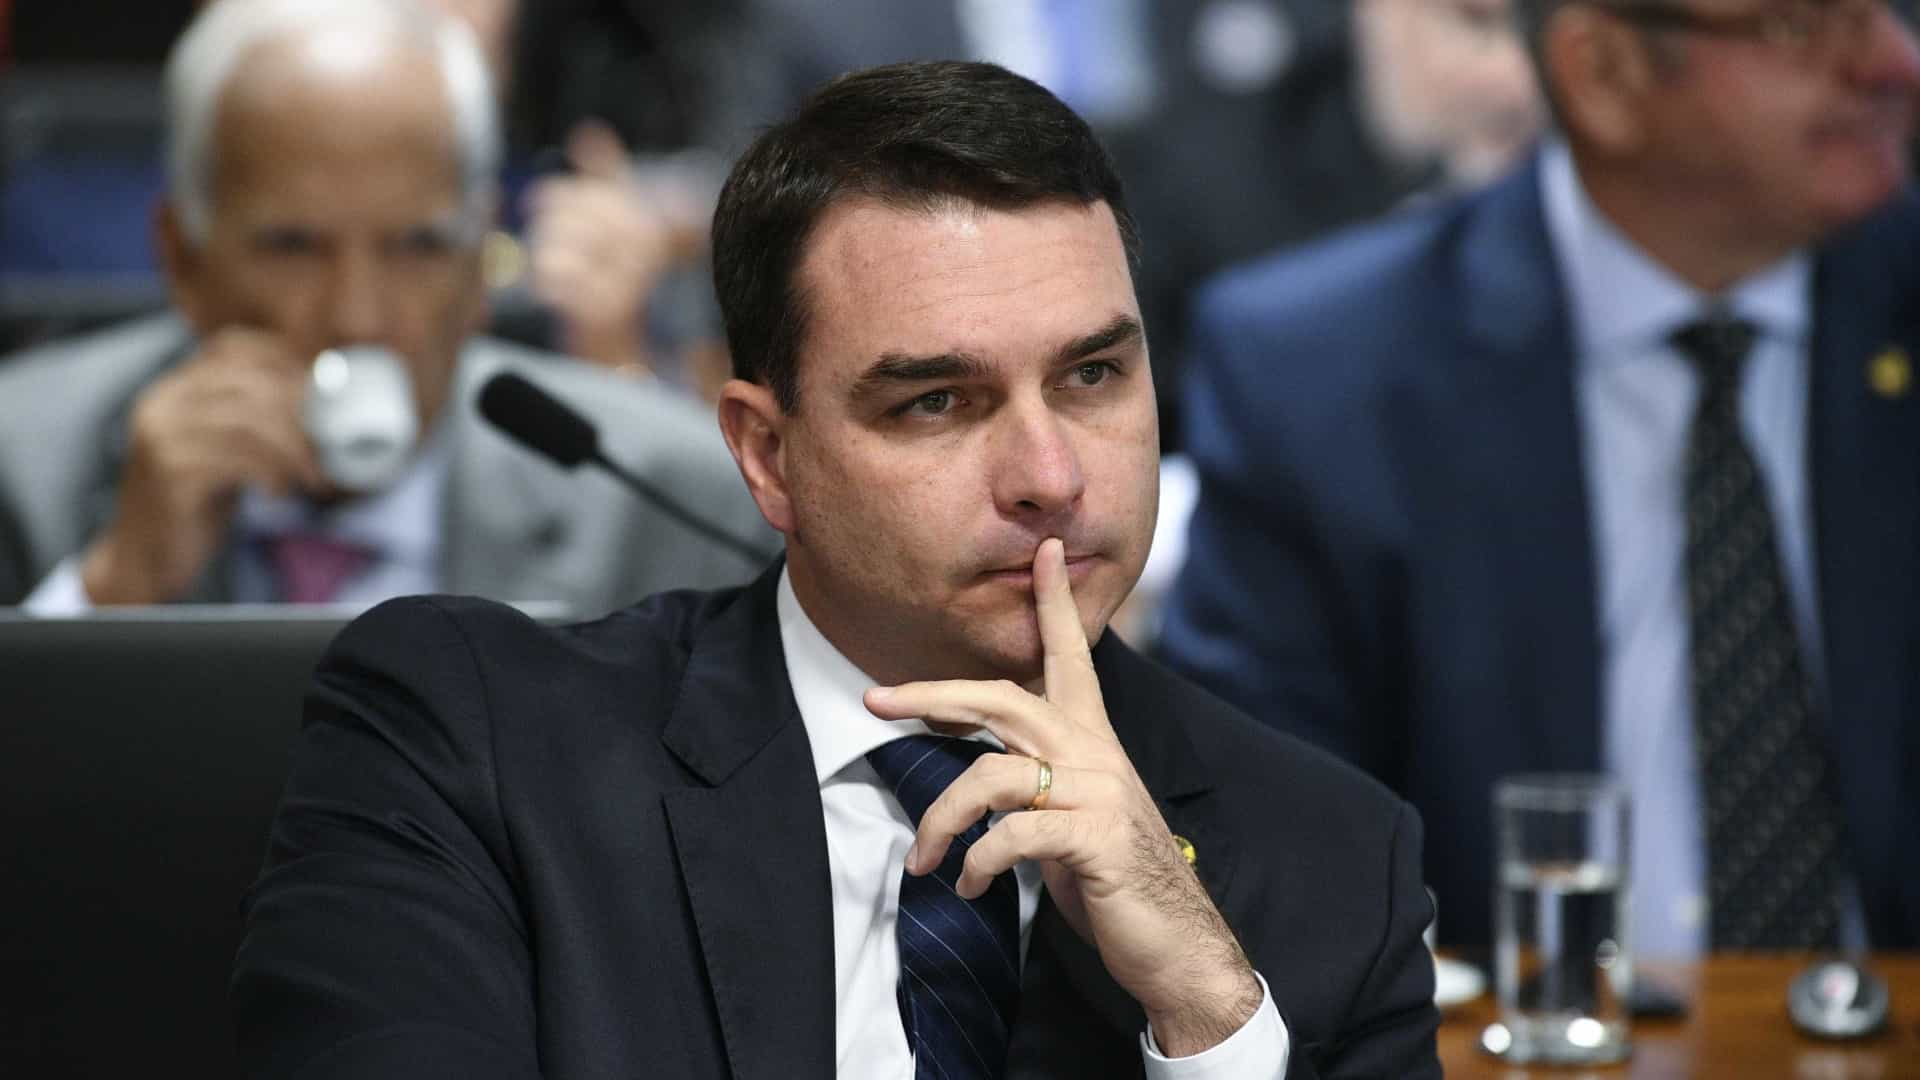 Justiça nega pedido de Flávio Bolsonaro para suspender quebra de sigilo